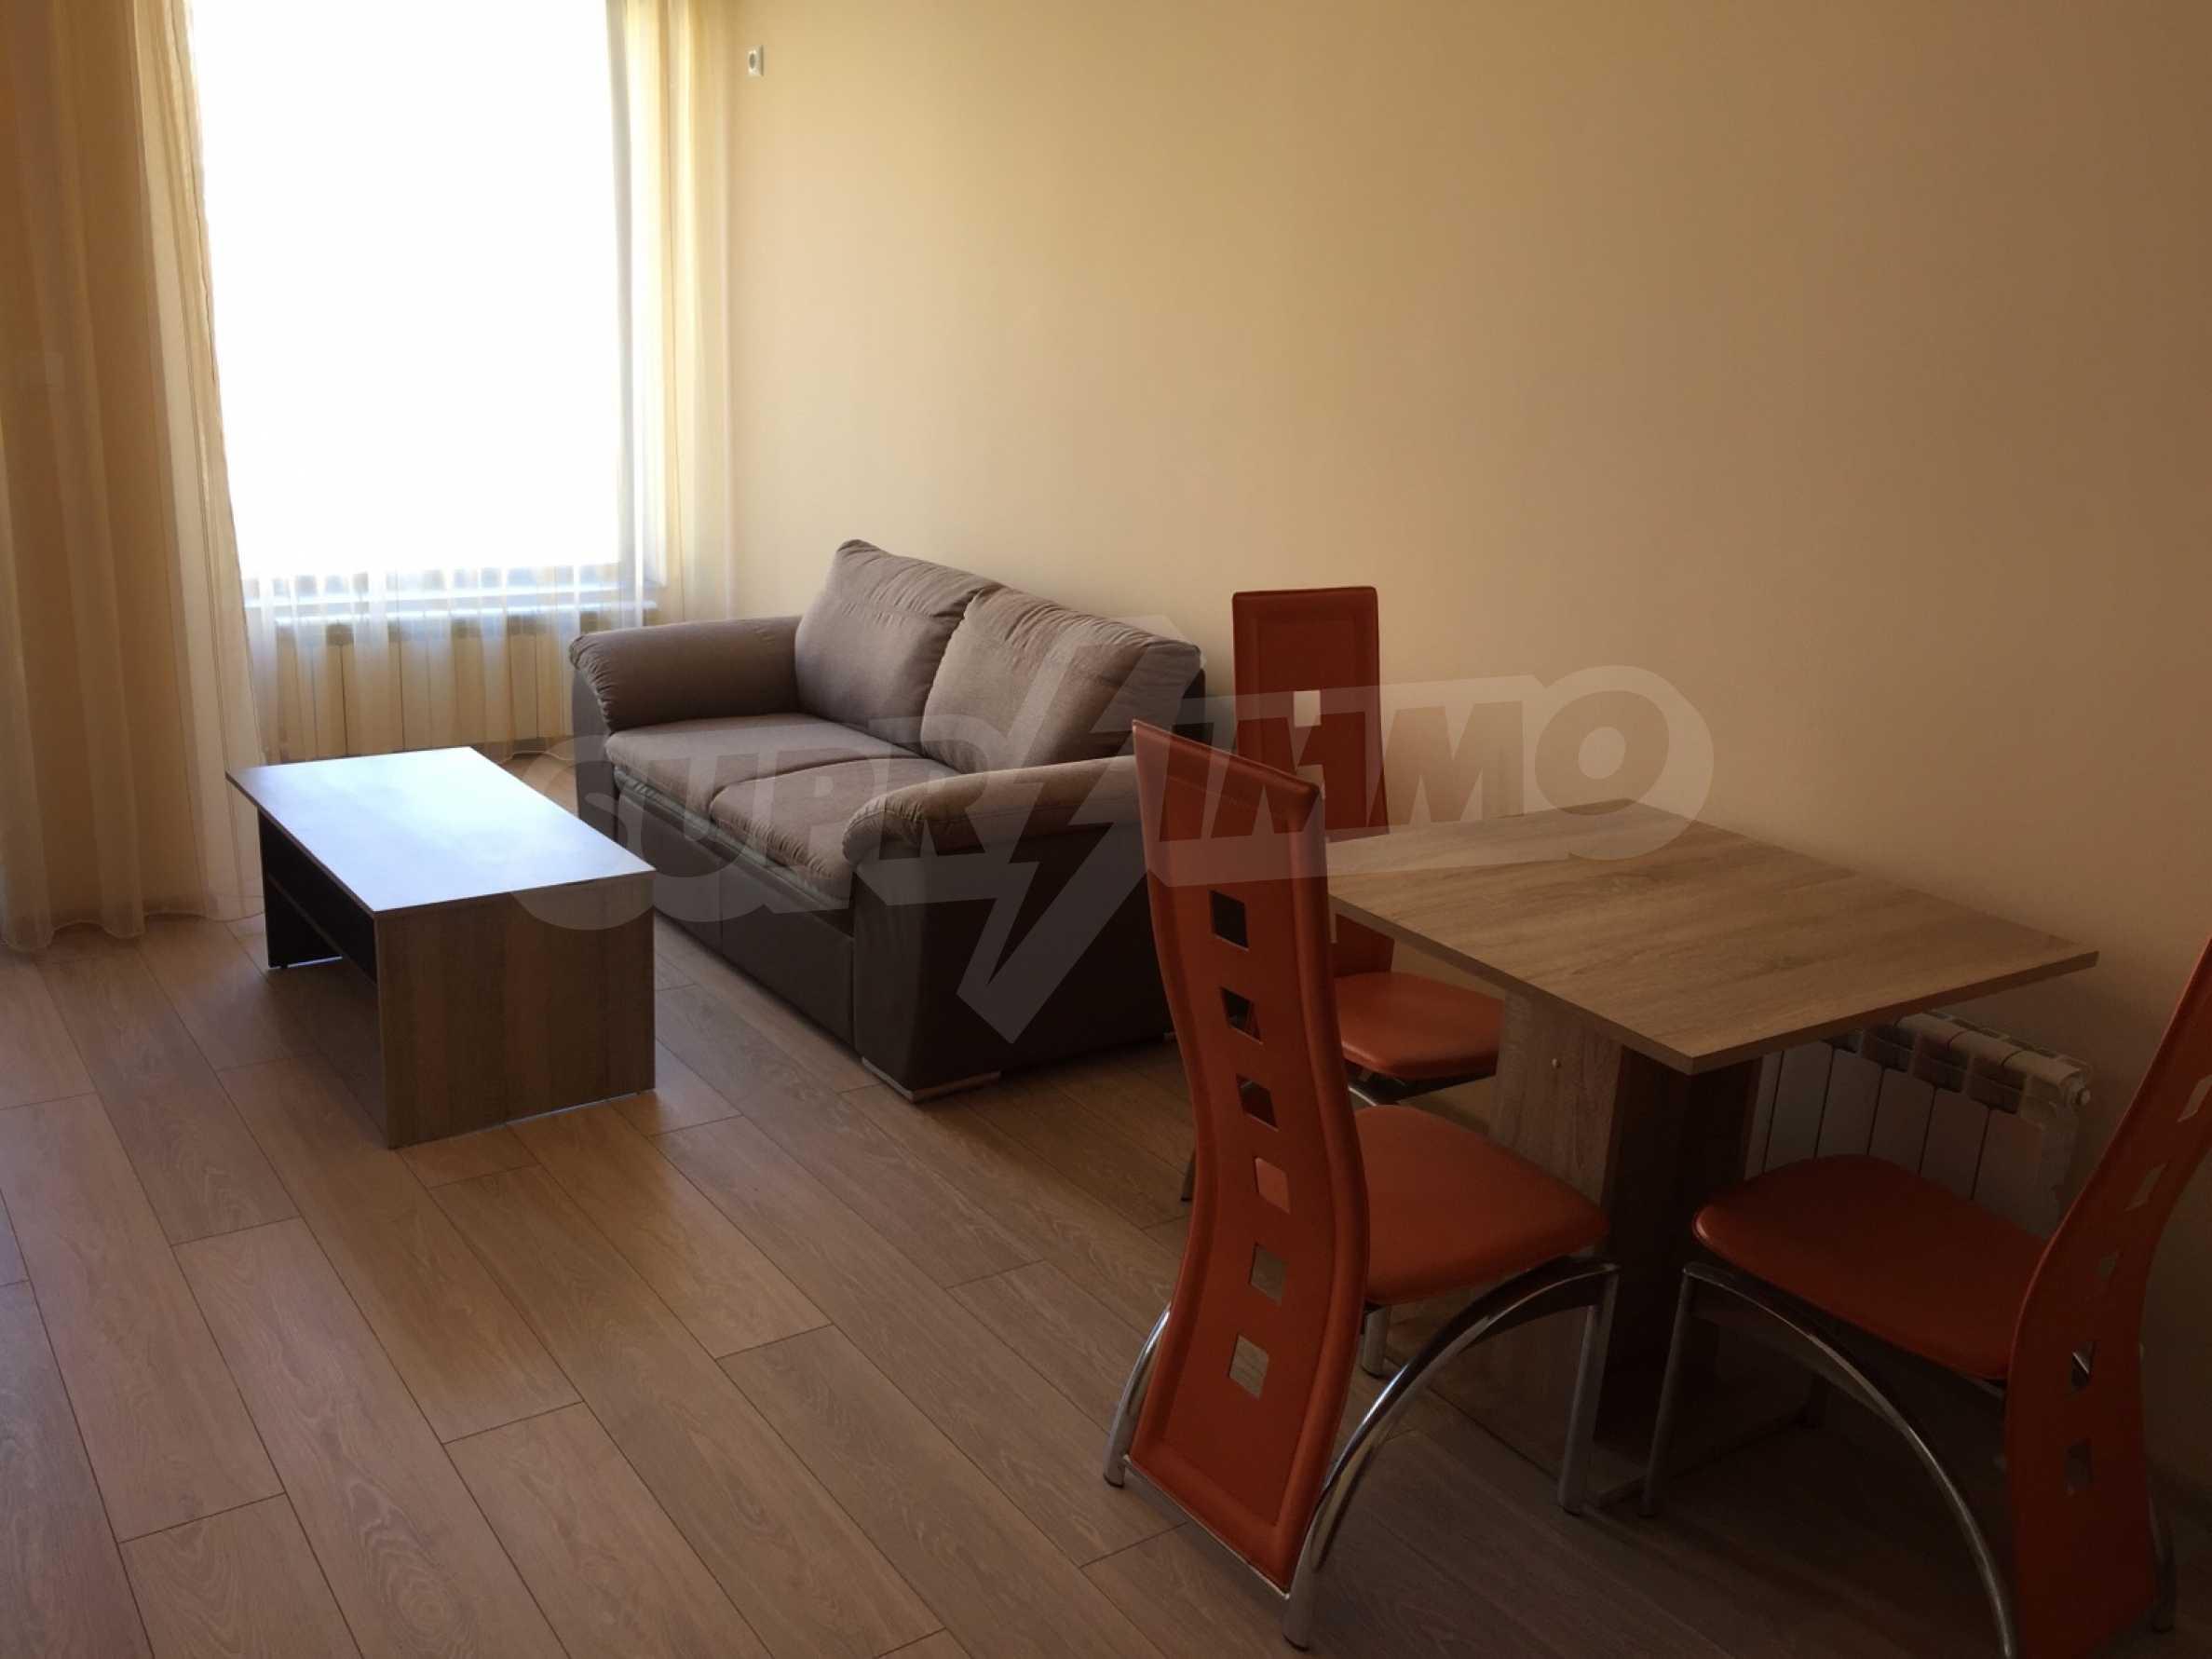 Cozy, one-bedroom apartment for rent in Studentski grad near NSA